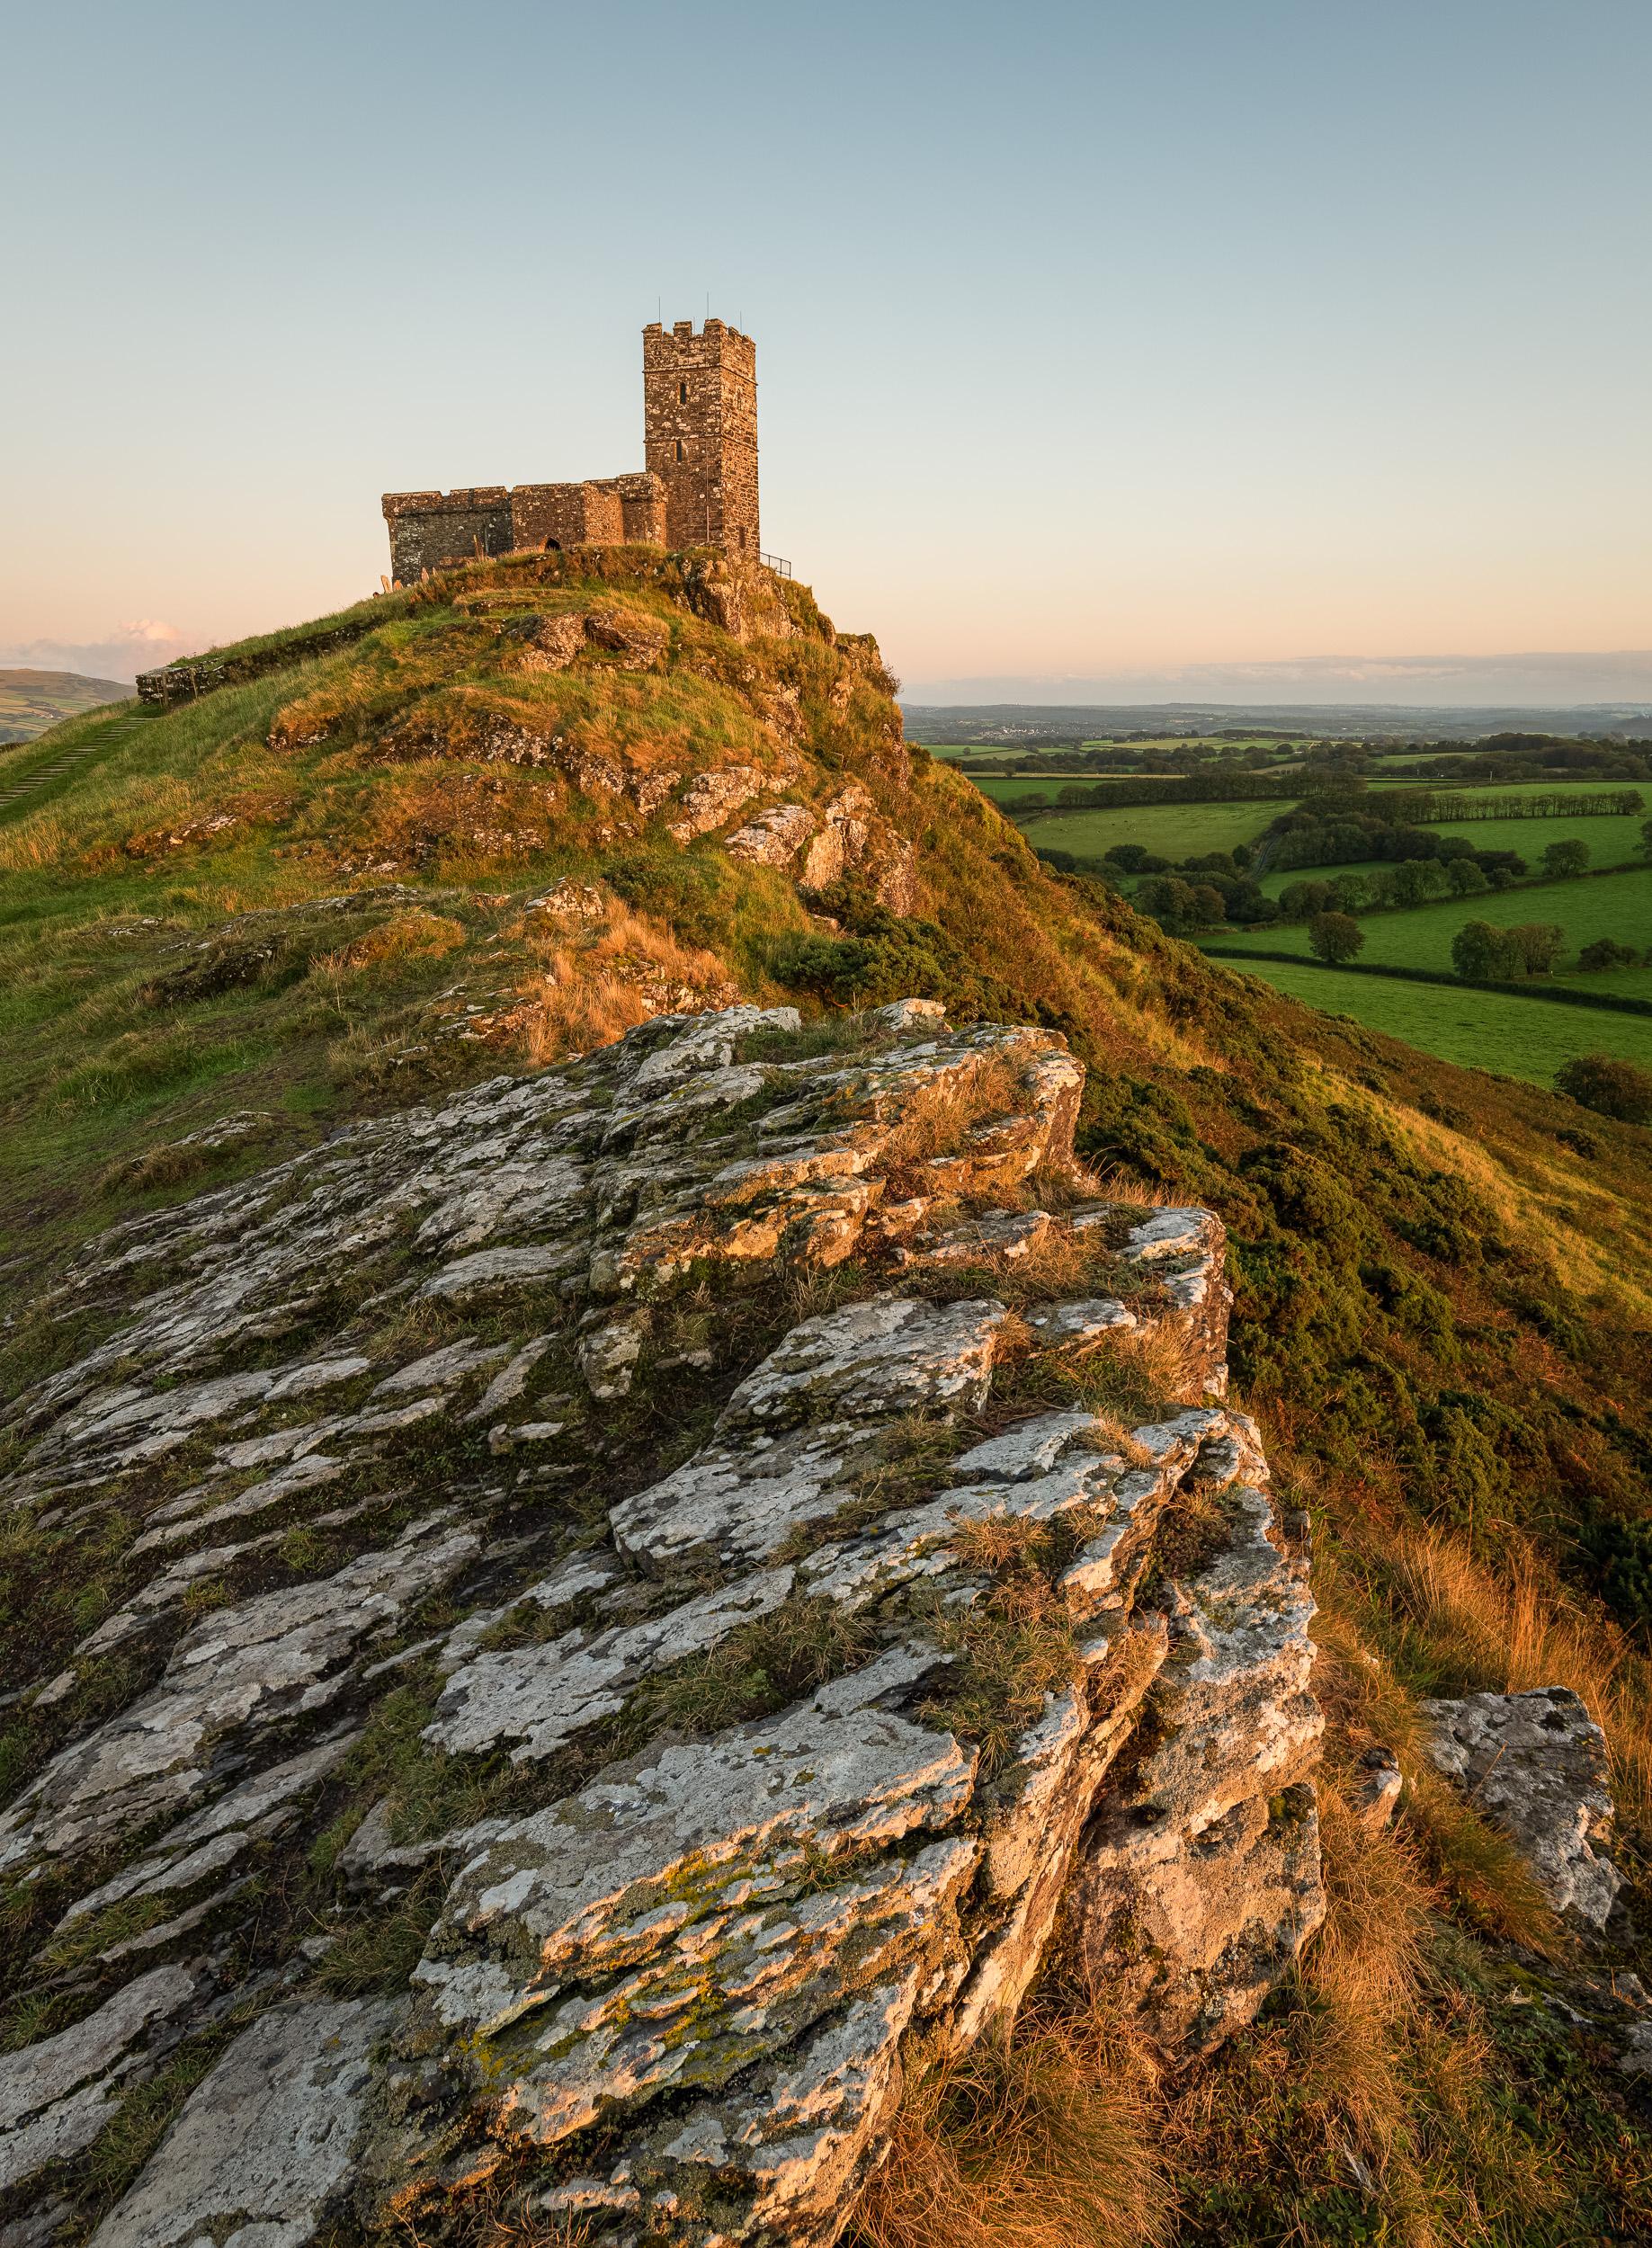 Brentor Church Sunset #2, Dartmoor, Devon  - Nikon D850, Nikkor 16-35 mm f/4 at 19 mm, f/8, 1/6th sec at ISO 64, Kase CPL. Focus stacked image.